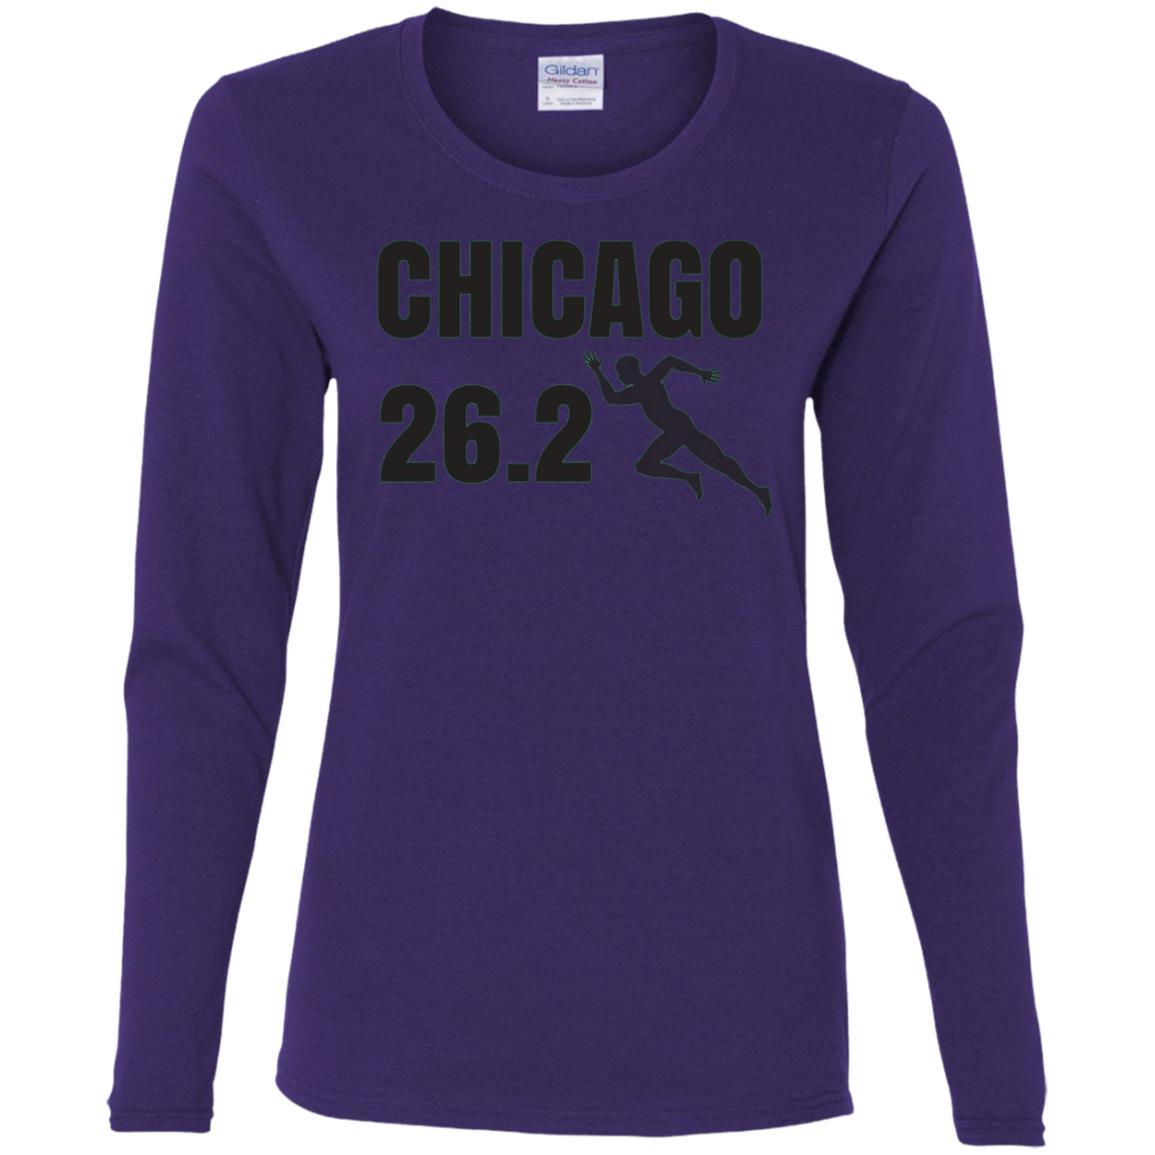 Chicago 26.2 Miles Marathon Running Women Long Sleeve T-Shirt